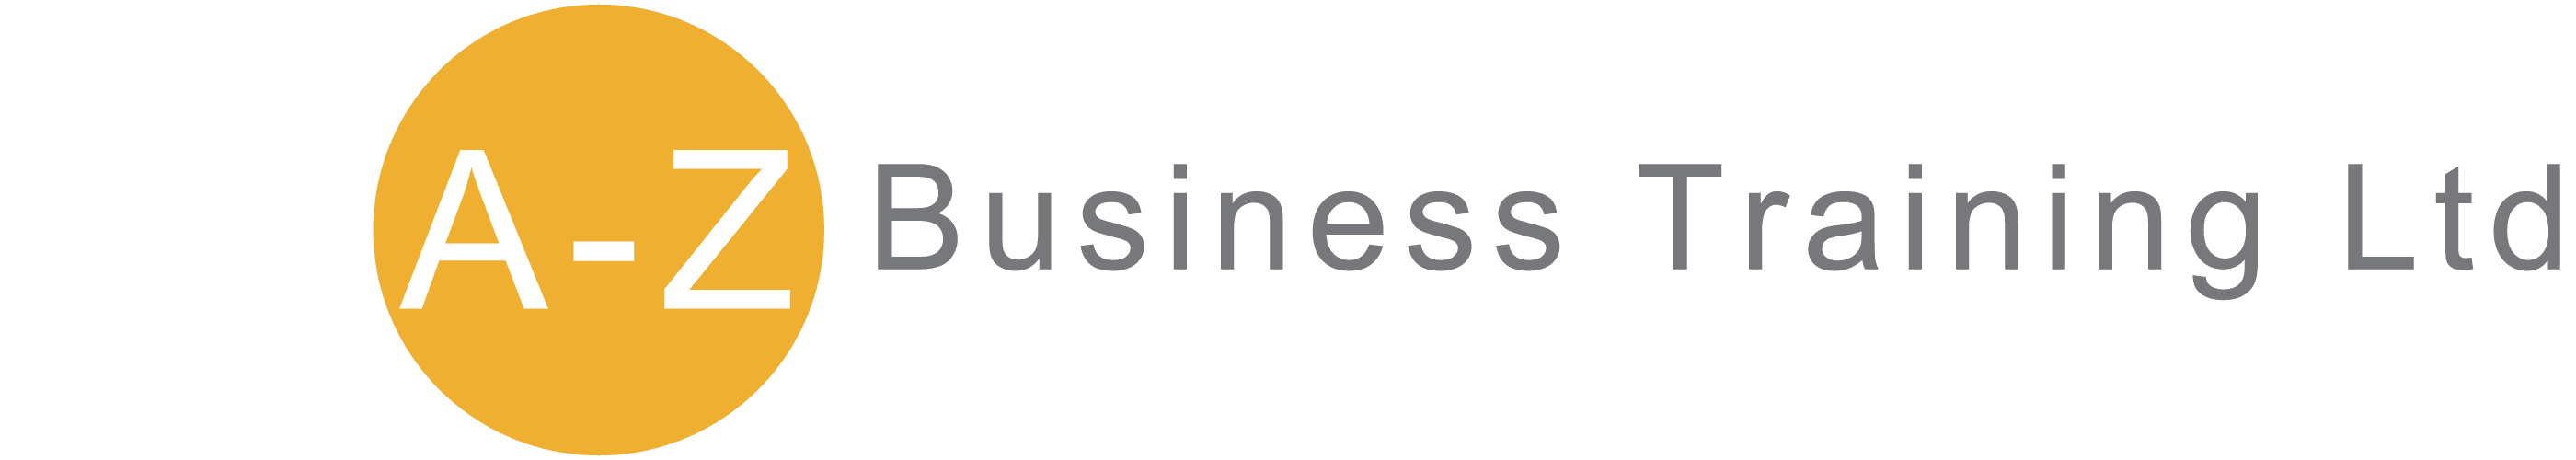 A-Z Business Training